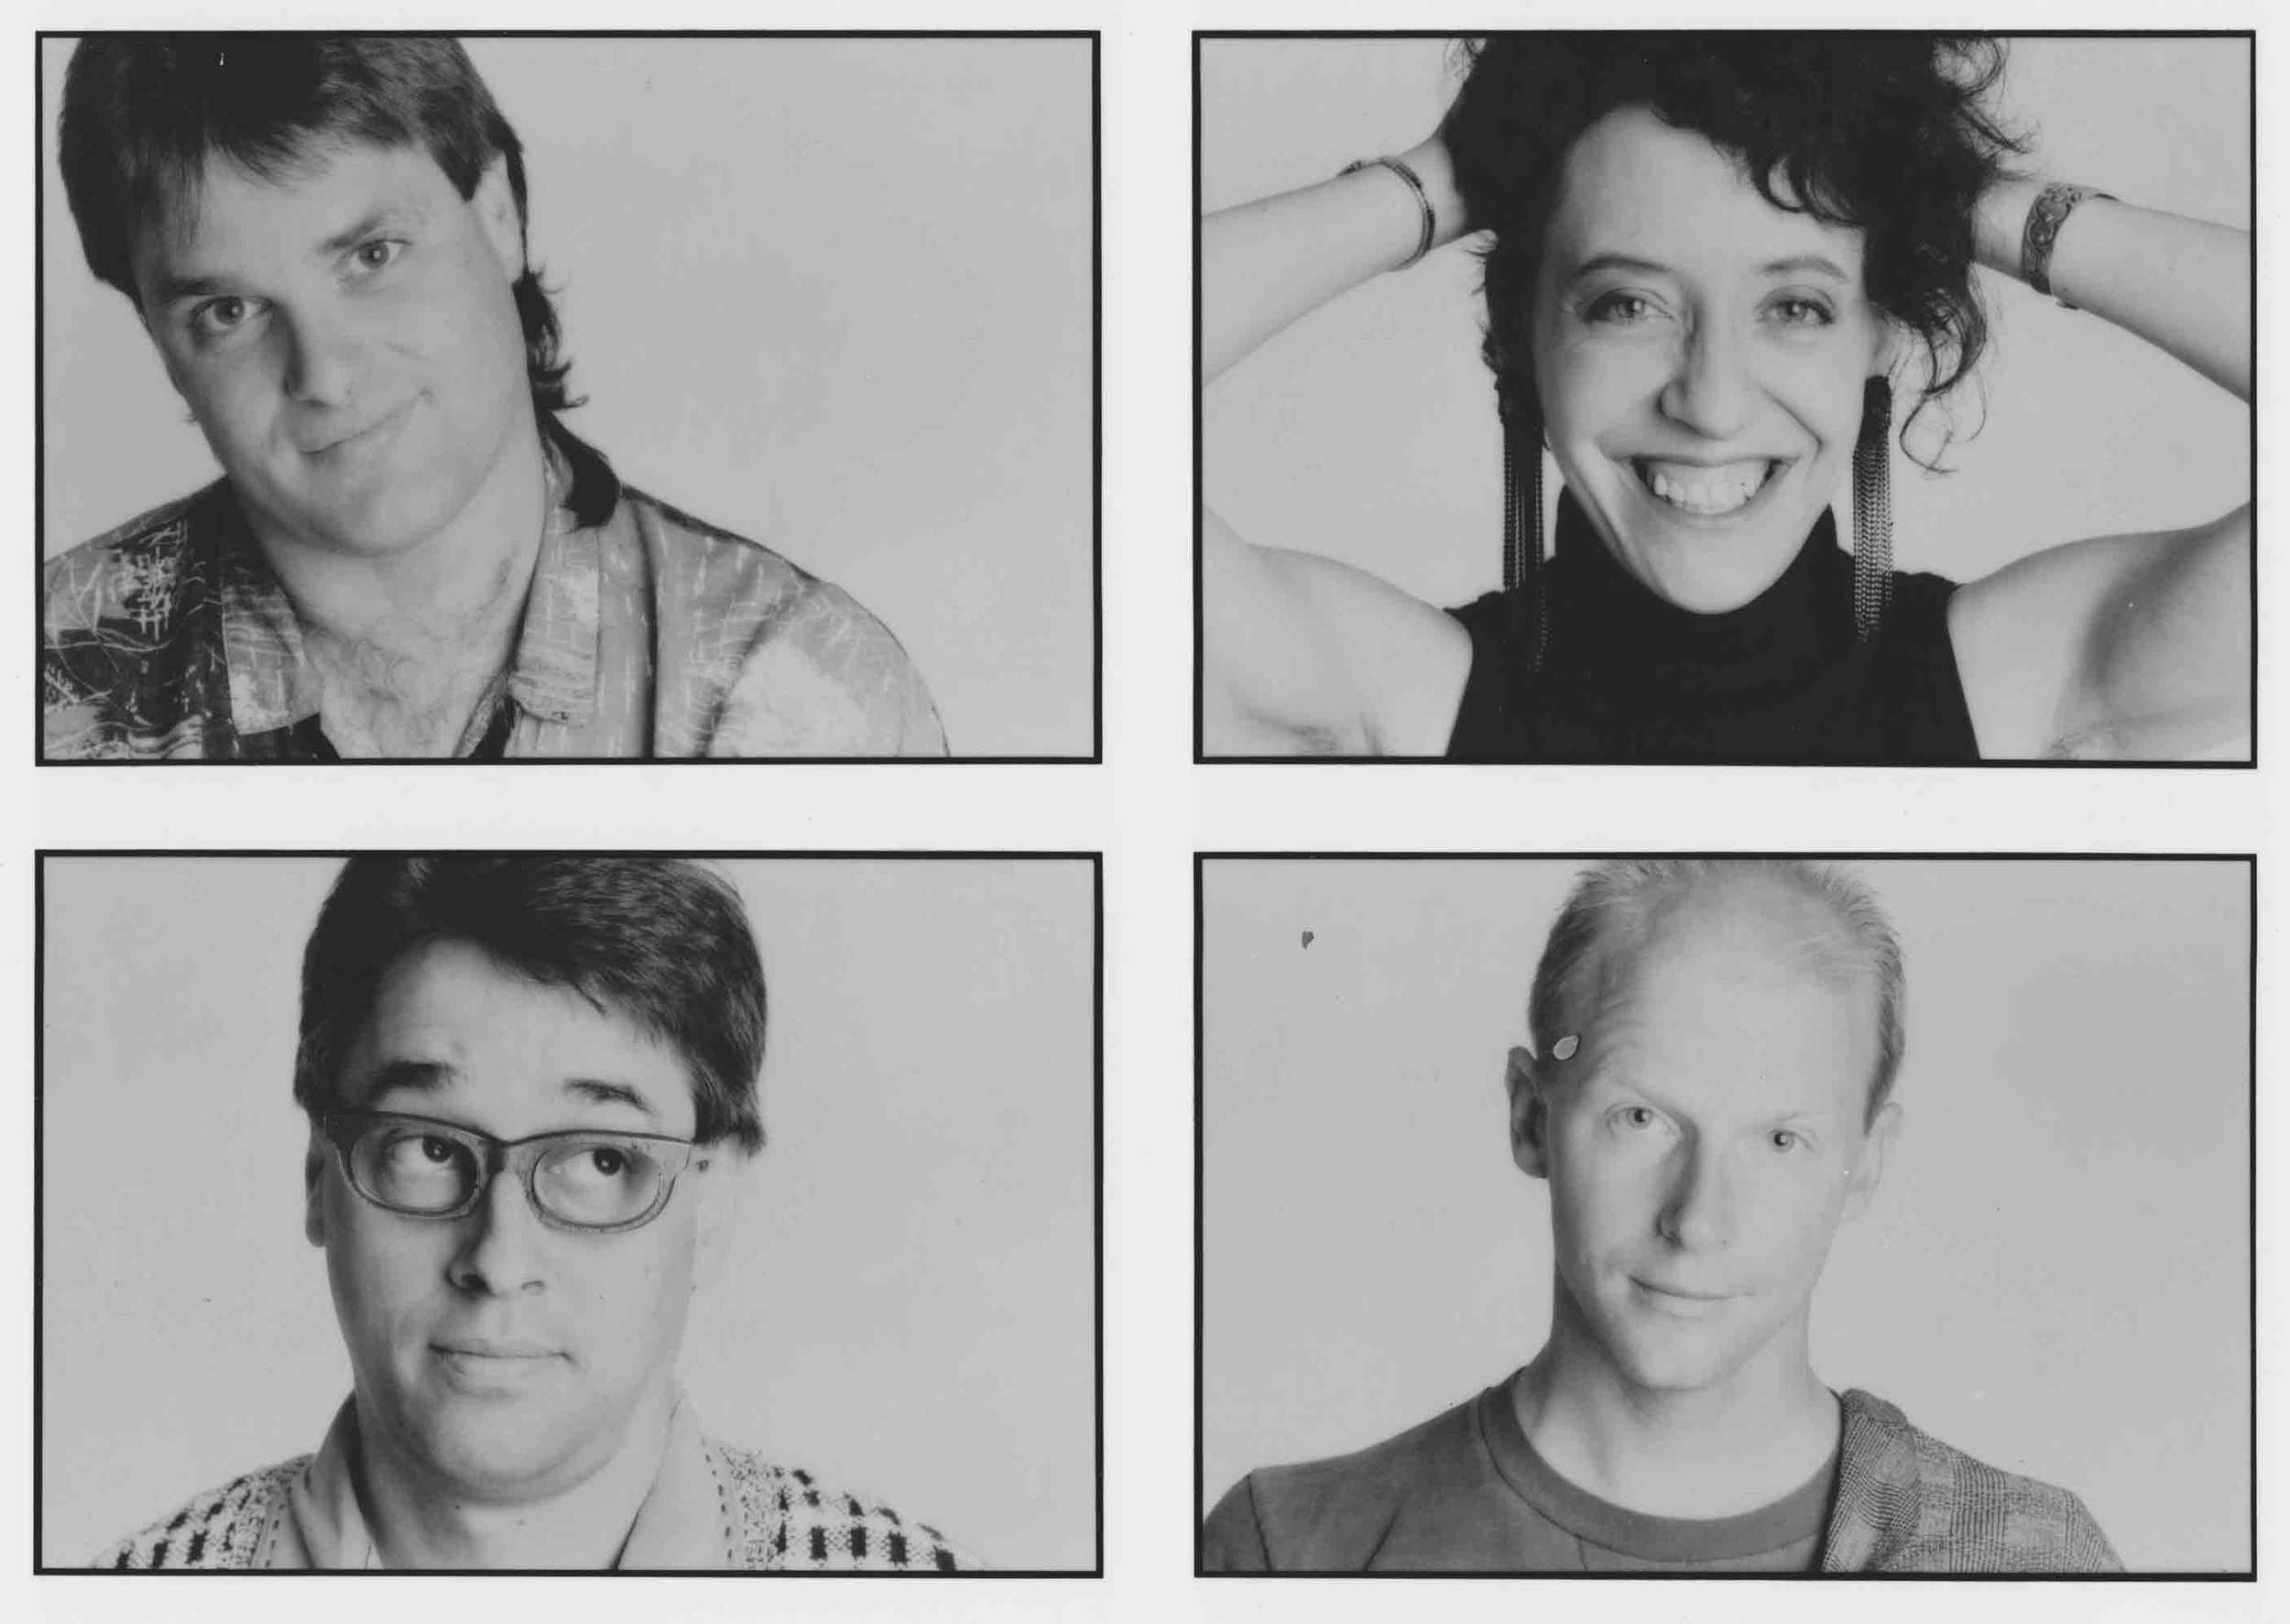 Matthew, Janie, Richard, Gunnar - 1982 - 89.